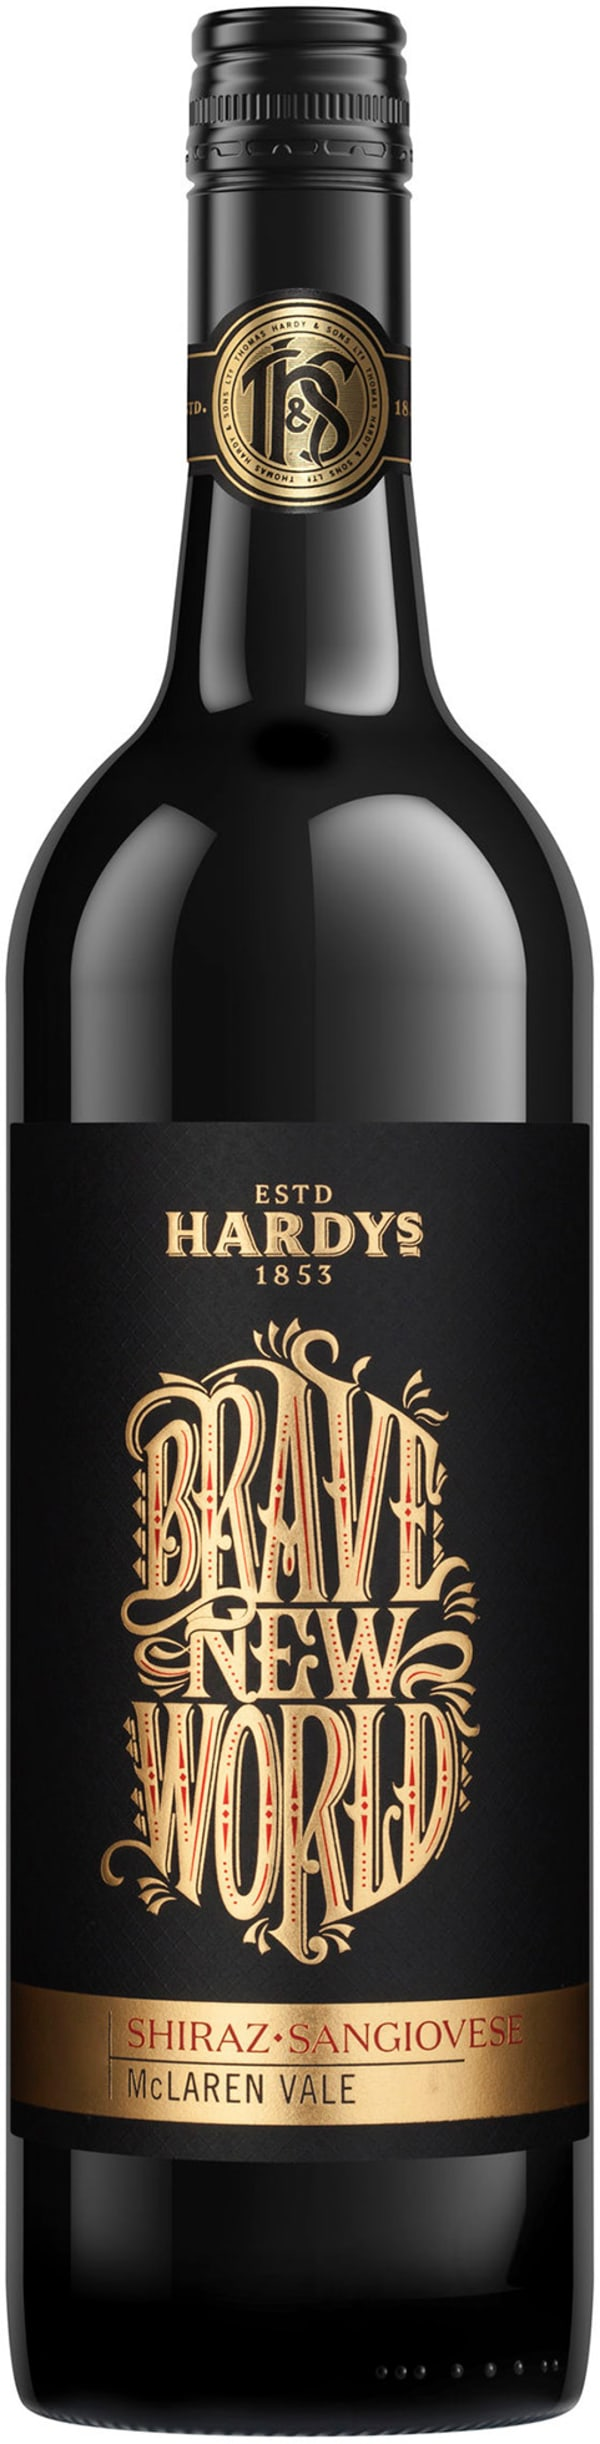 Hardys Brave New World Shiraz-Sangiovese 2017